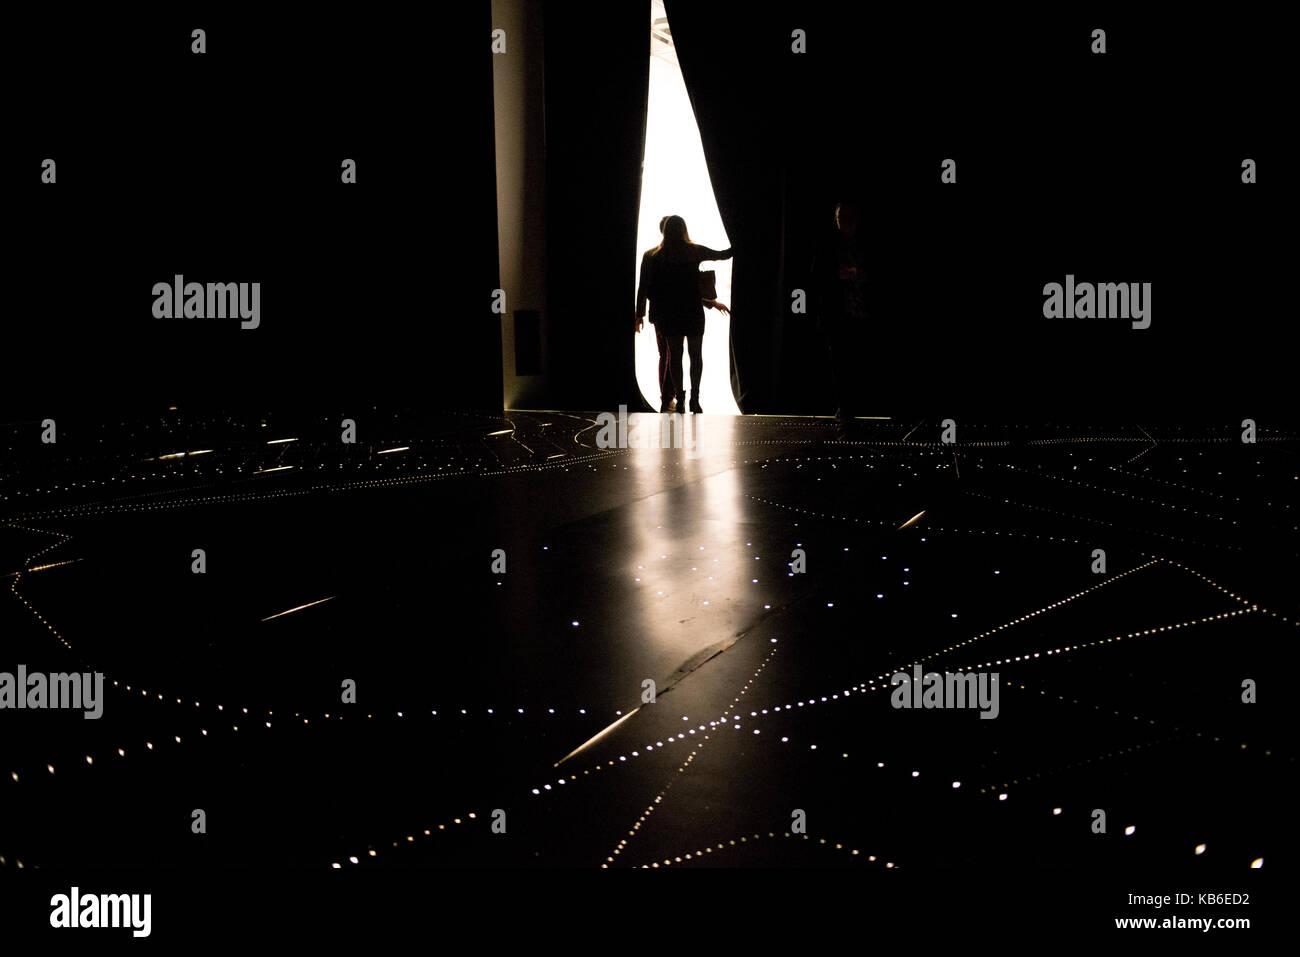 Two people leaving an installation of Carlos Garaicoa at the Center for Contemporary Art Luigi Pecci in Prato, Italy - Stock Image